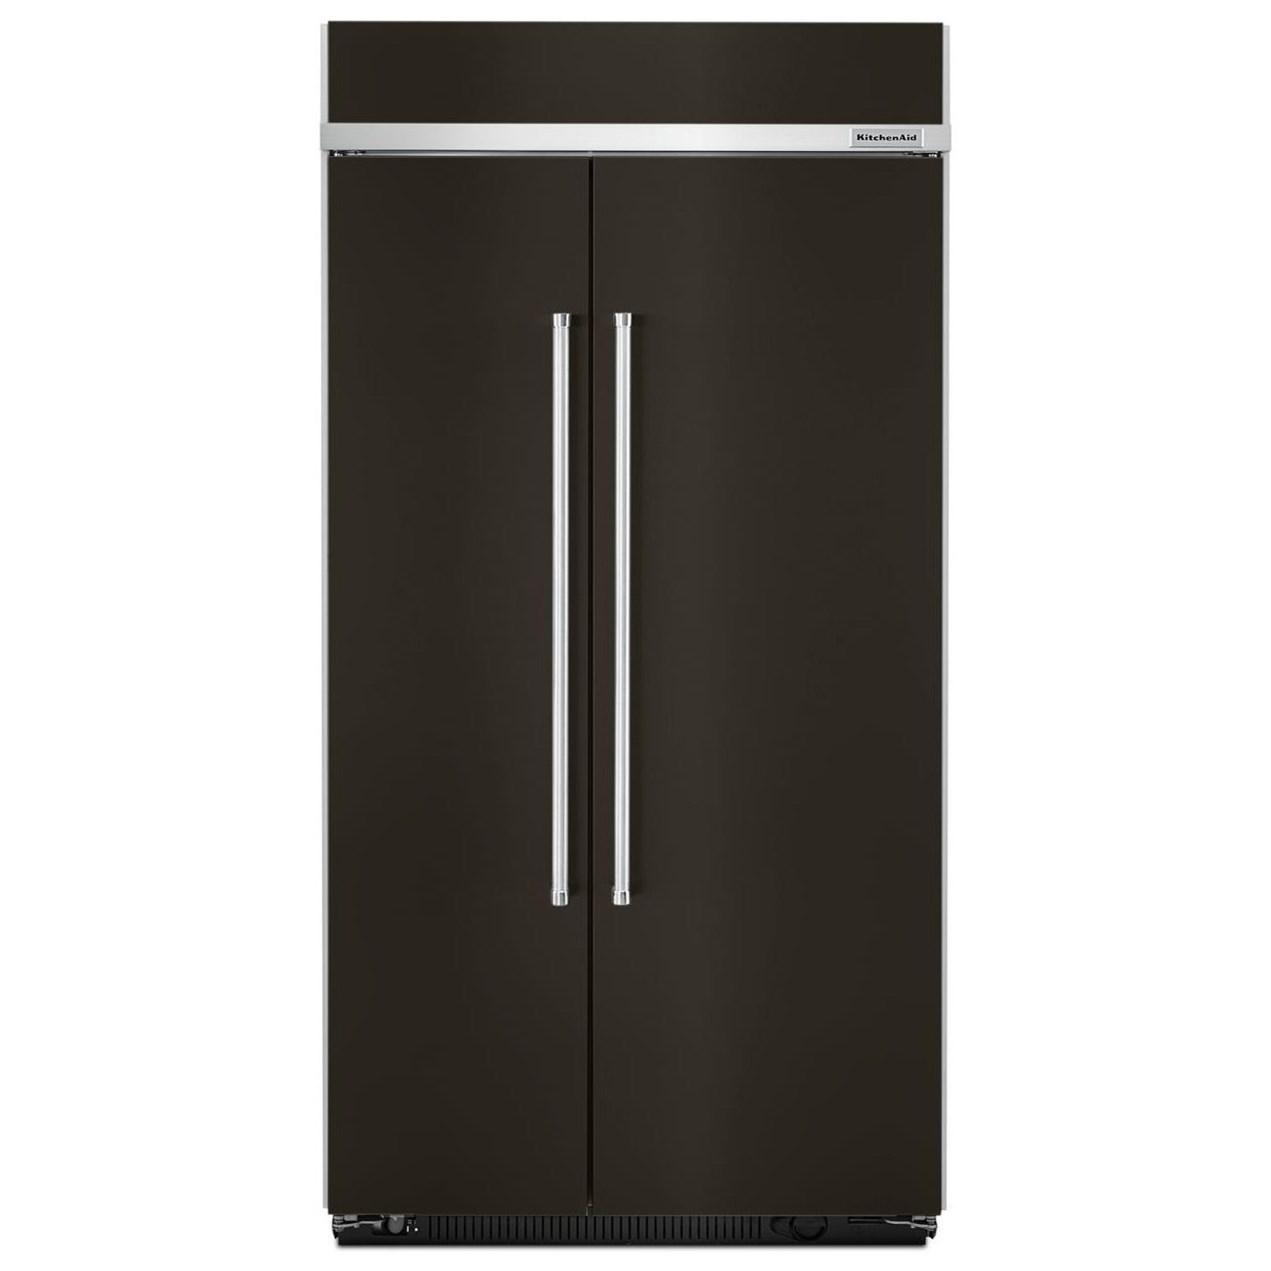 "KitchenAid Side-by-Side Refrigerator 42"" Width Built-In SideXSide Refrigerator by KitchenAid at Pedigo Furniture"